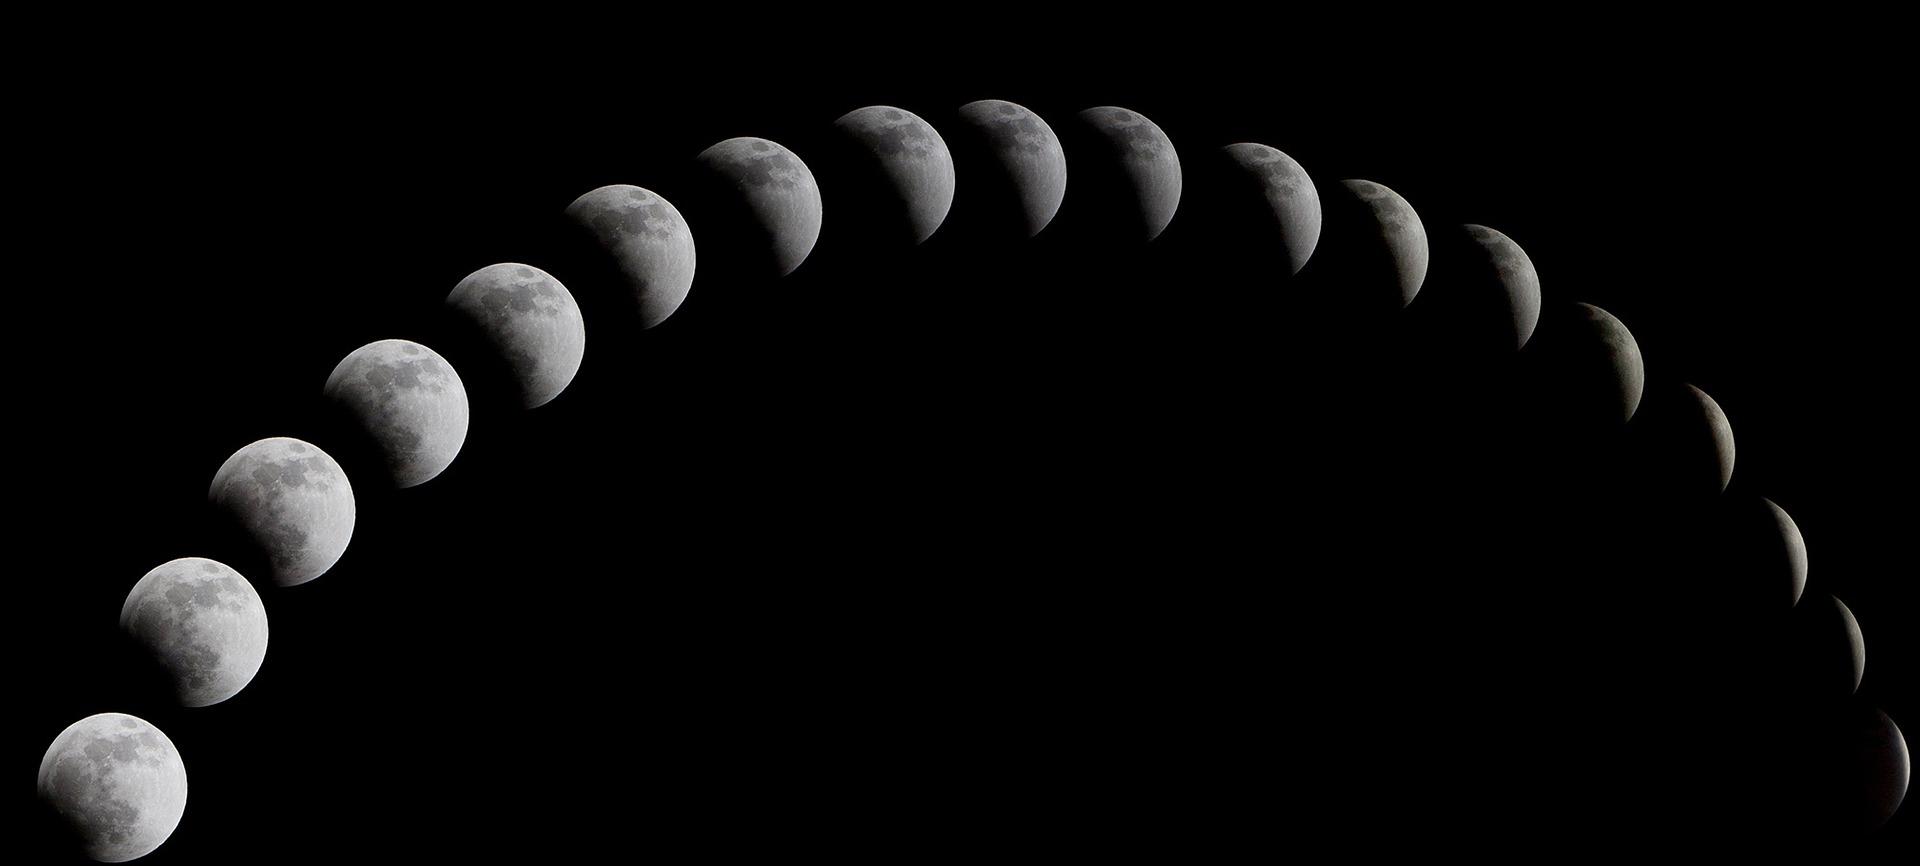 a-total-solar-eclipse-1113799_1920